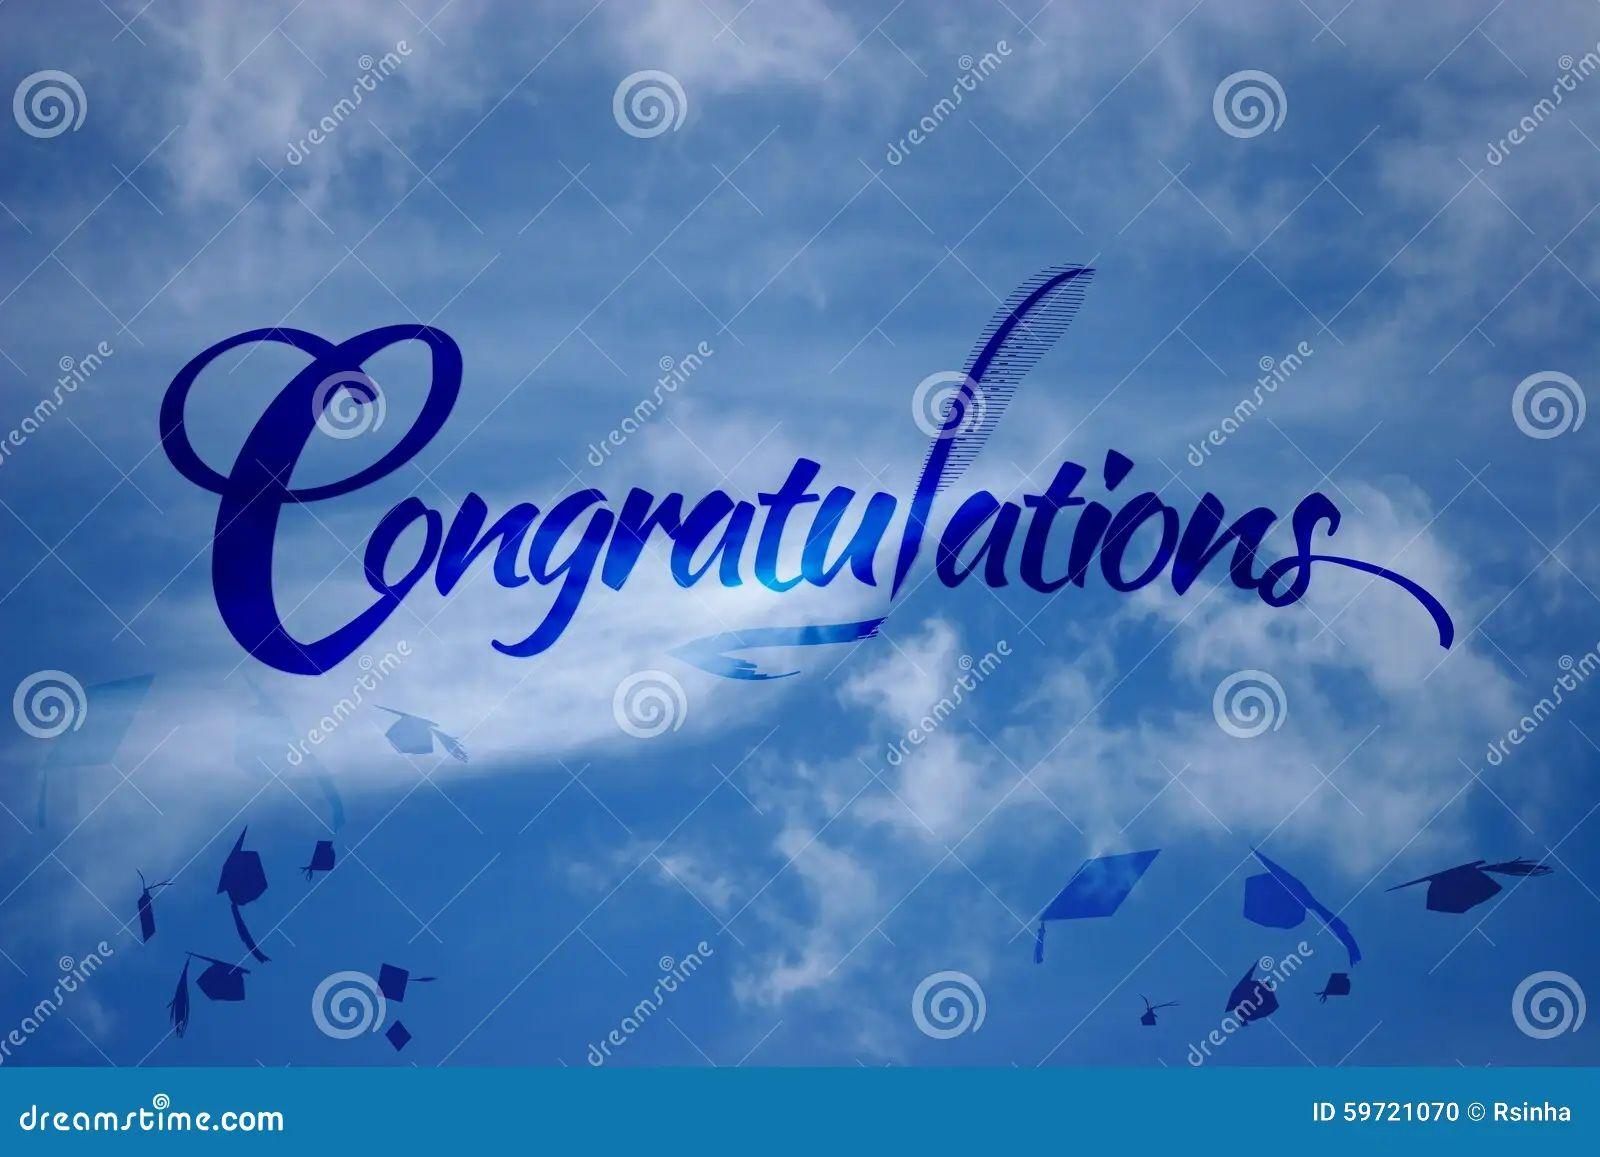 congratulations graduation banner